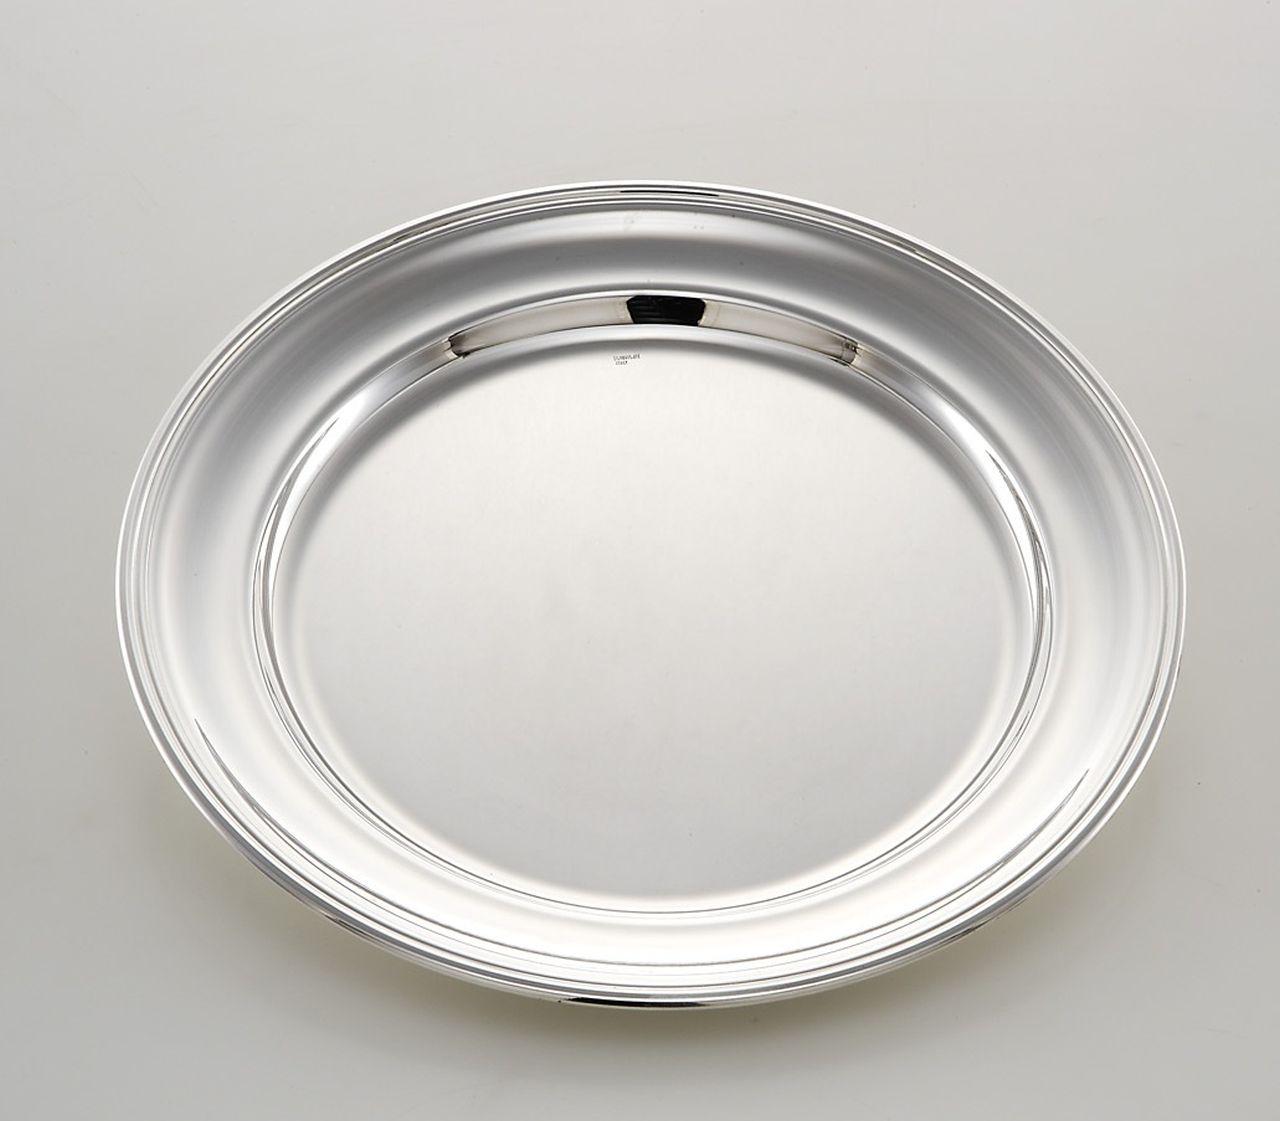 Piatto tondo portata stile Inglese argentato argento sheffield cm.diam.20